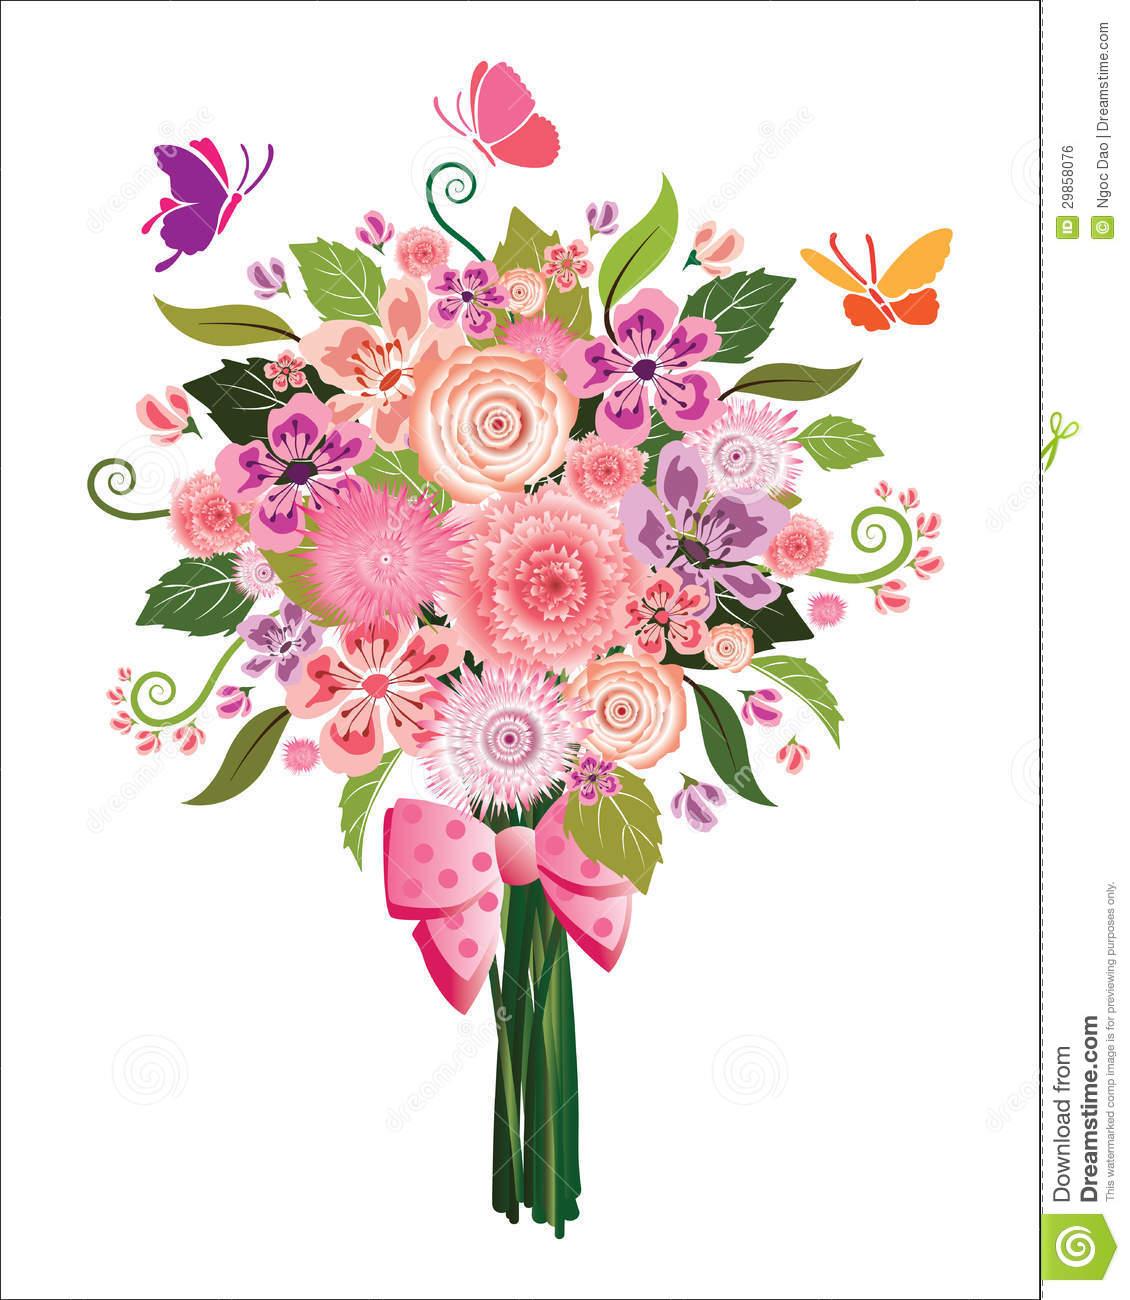 912 Flower Bouquet free clipart.